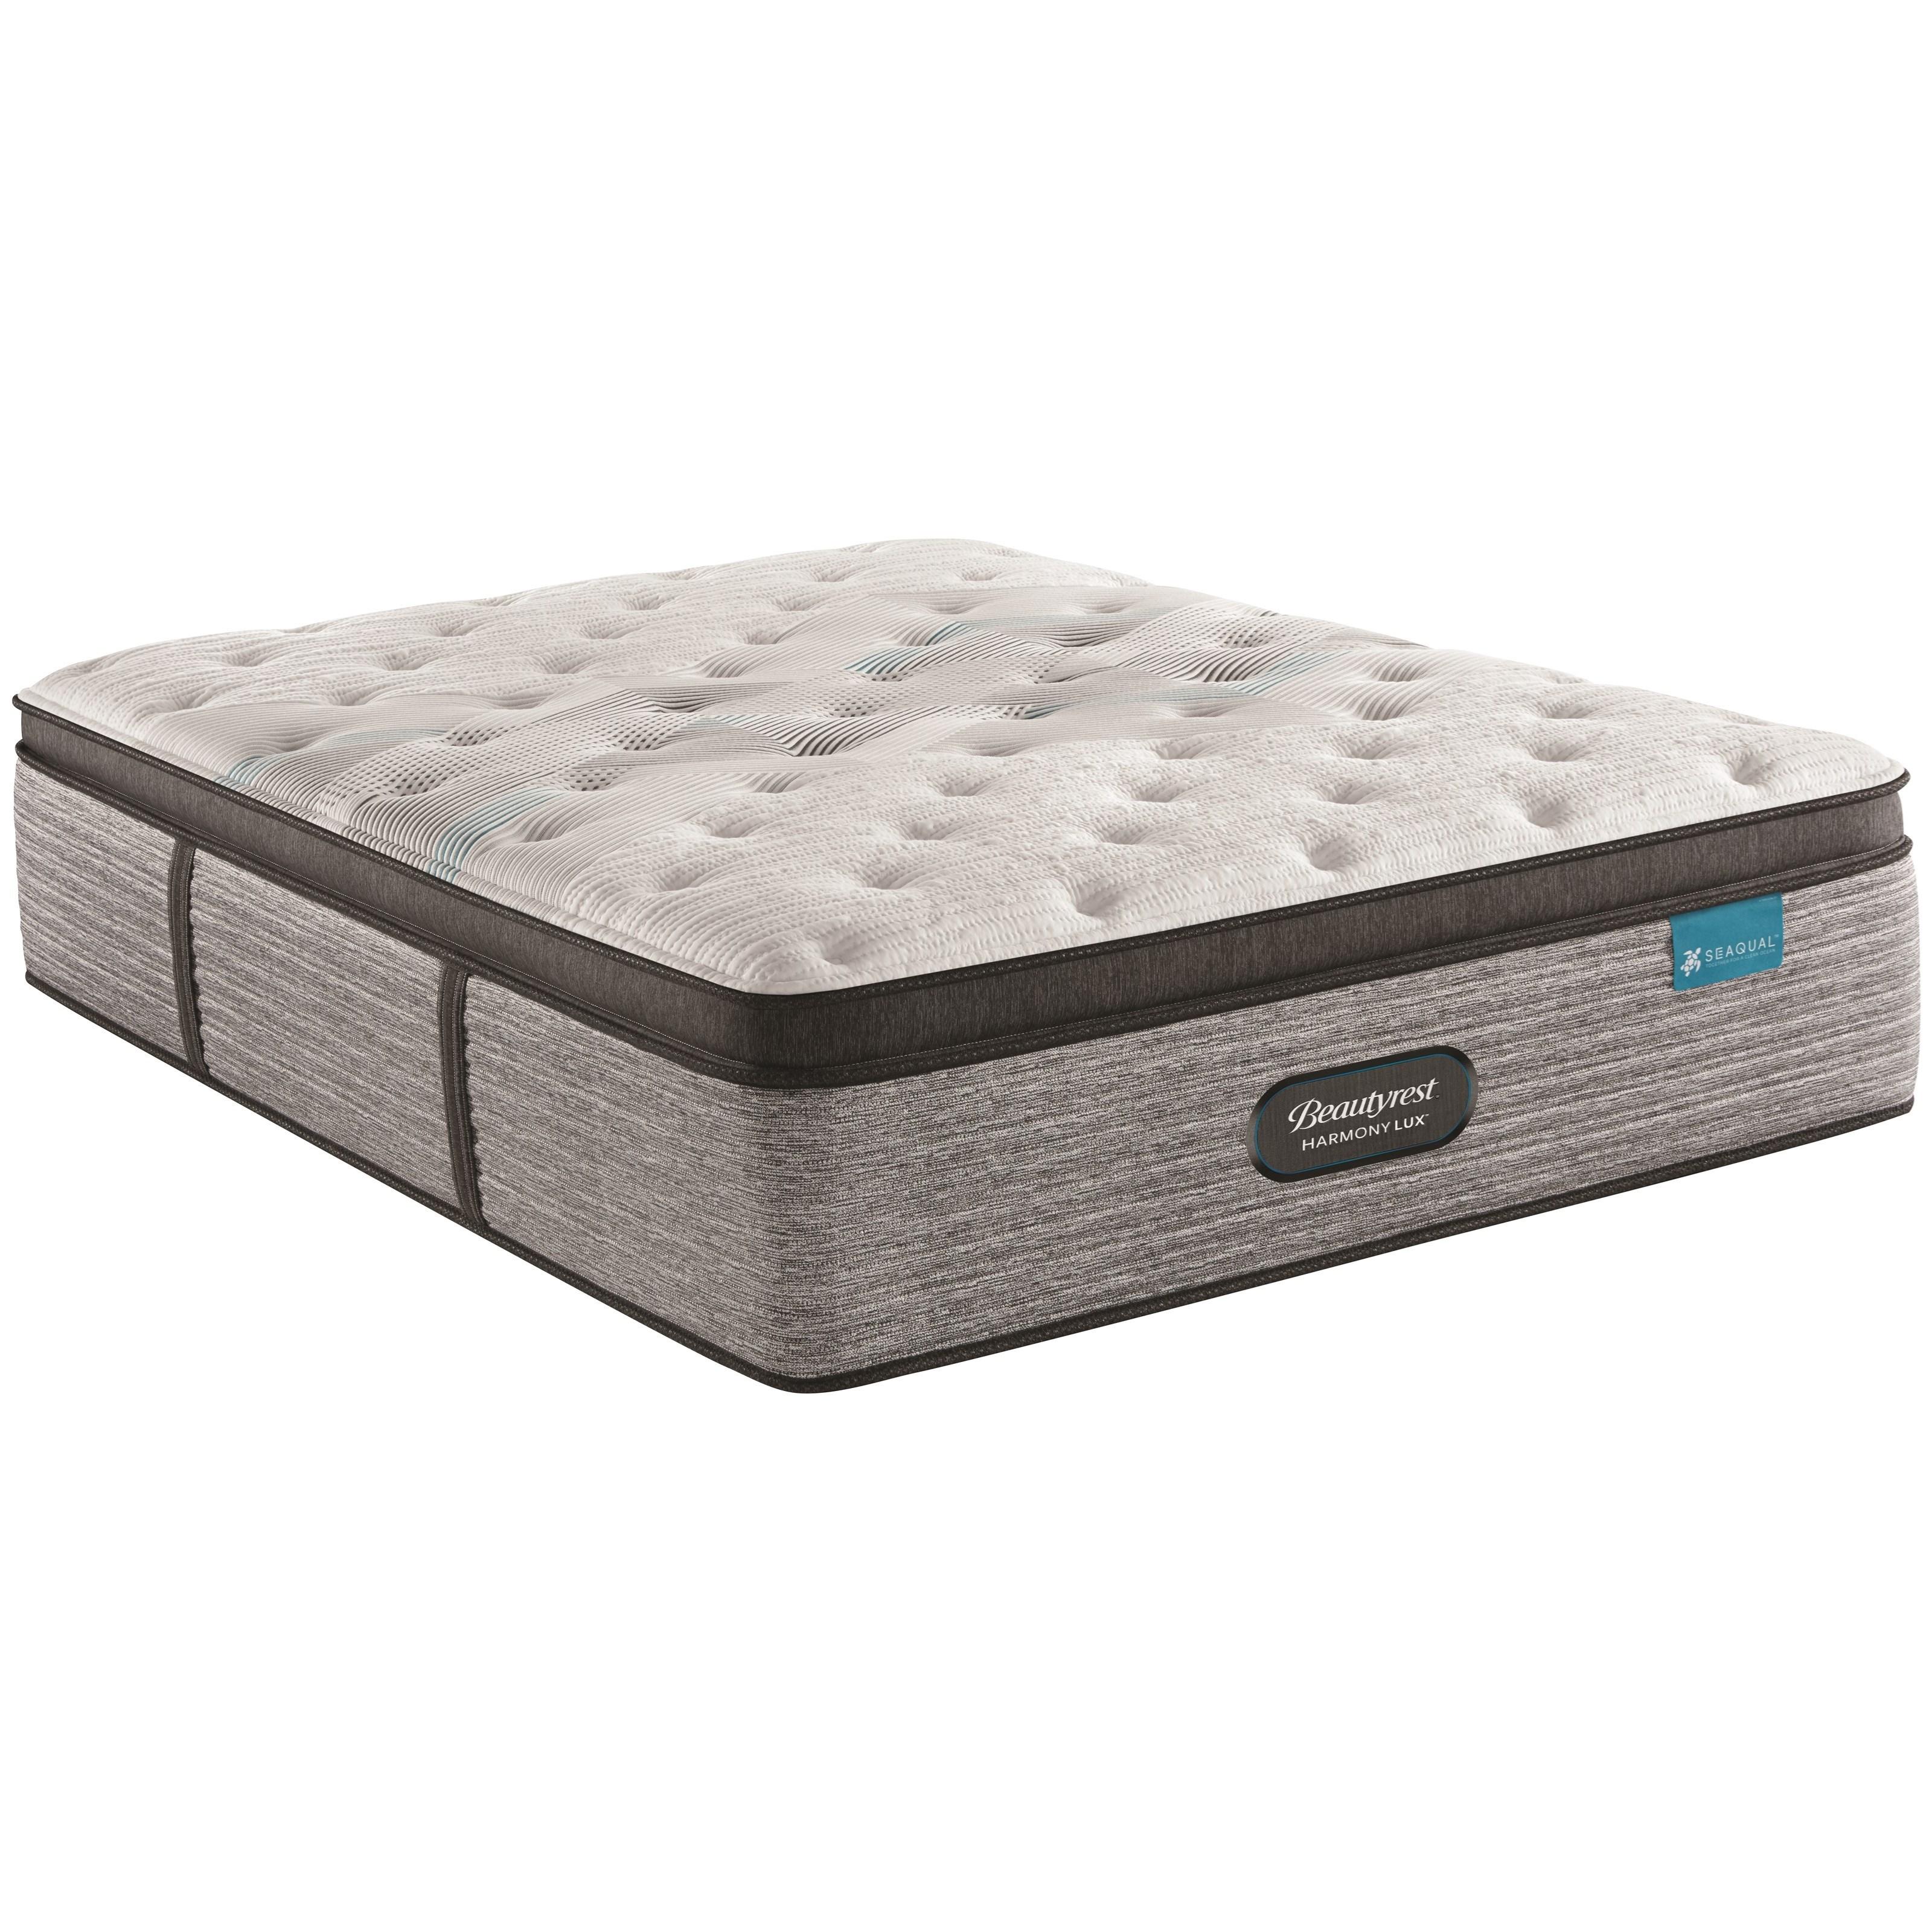 carbon series plush pt full 15 3 4 plush pillow top mattress